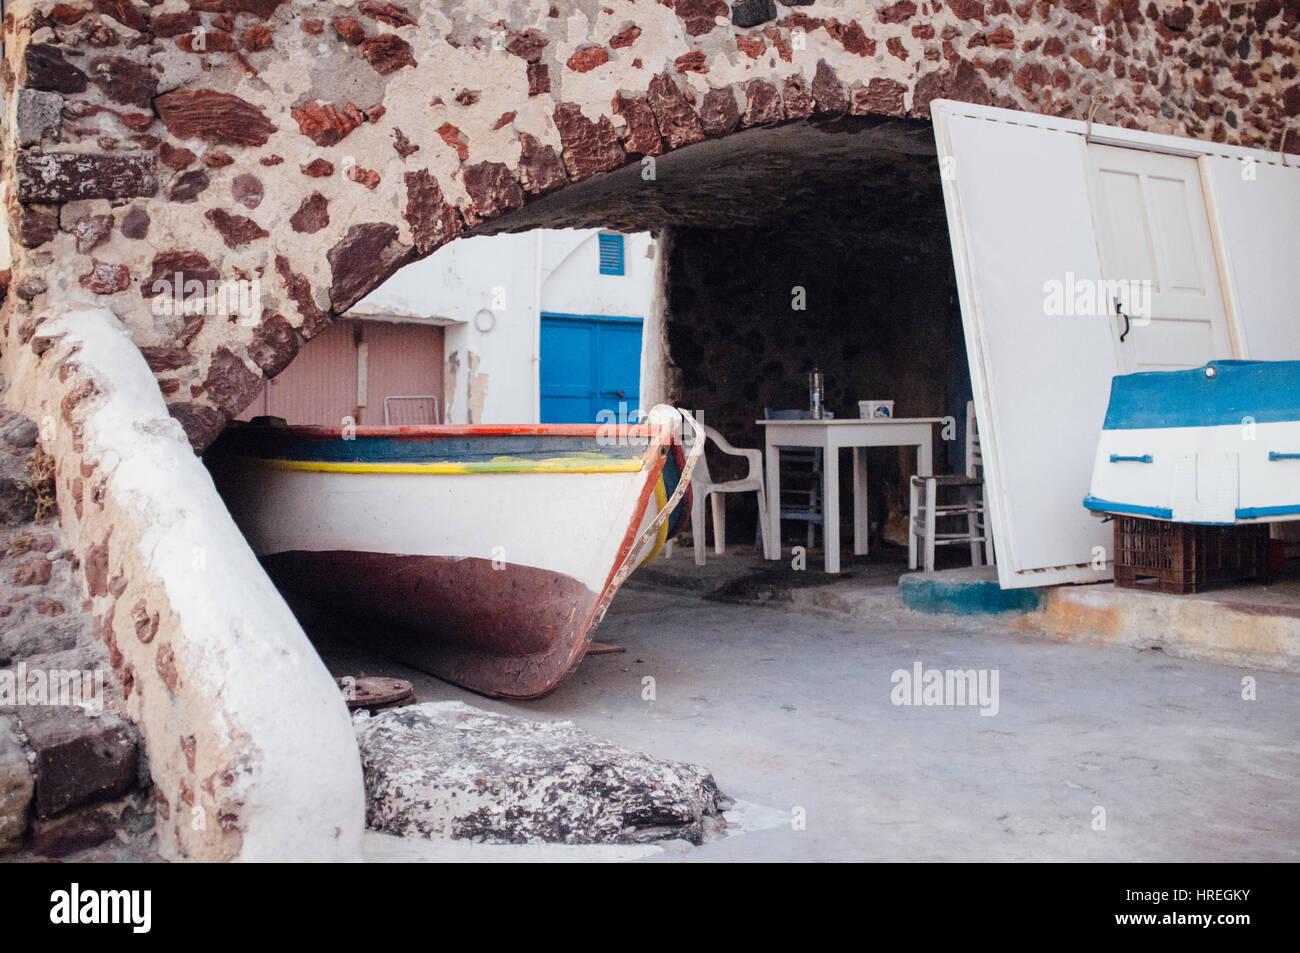 Mediterranean flair in beautiful Santorini, Greece. - Stock Image